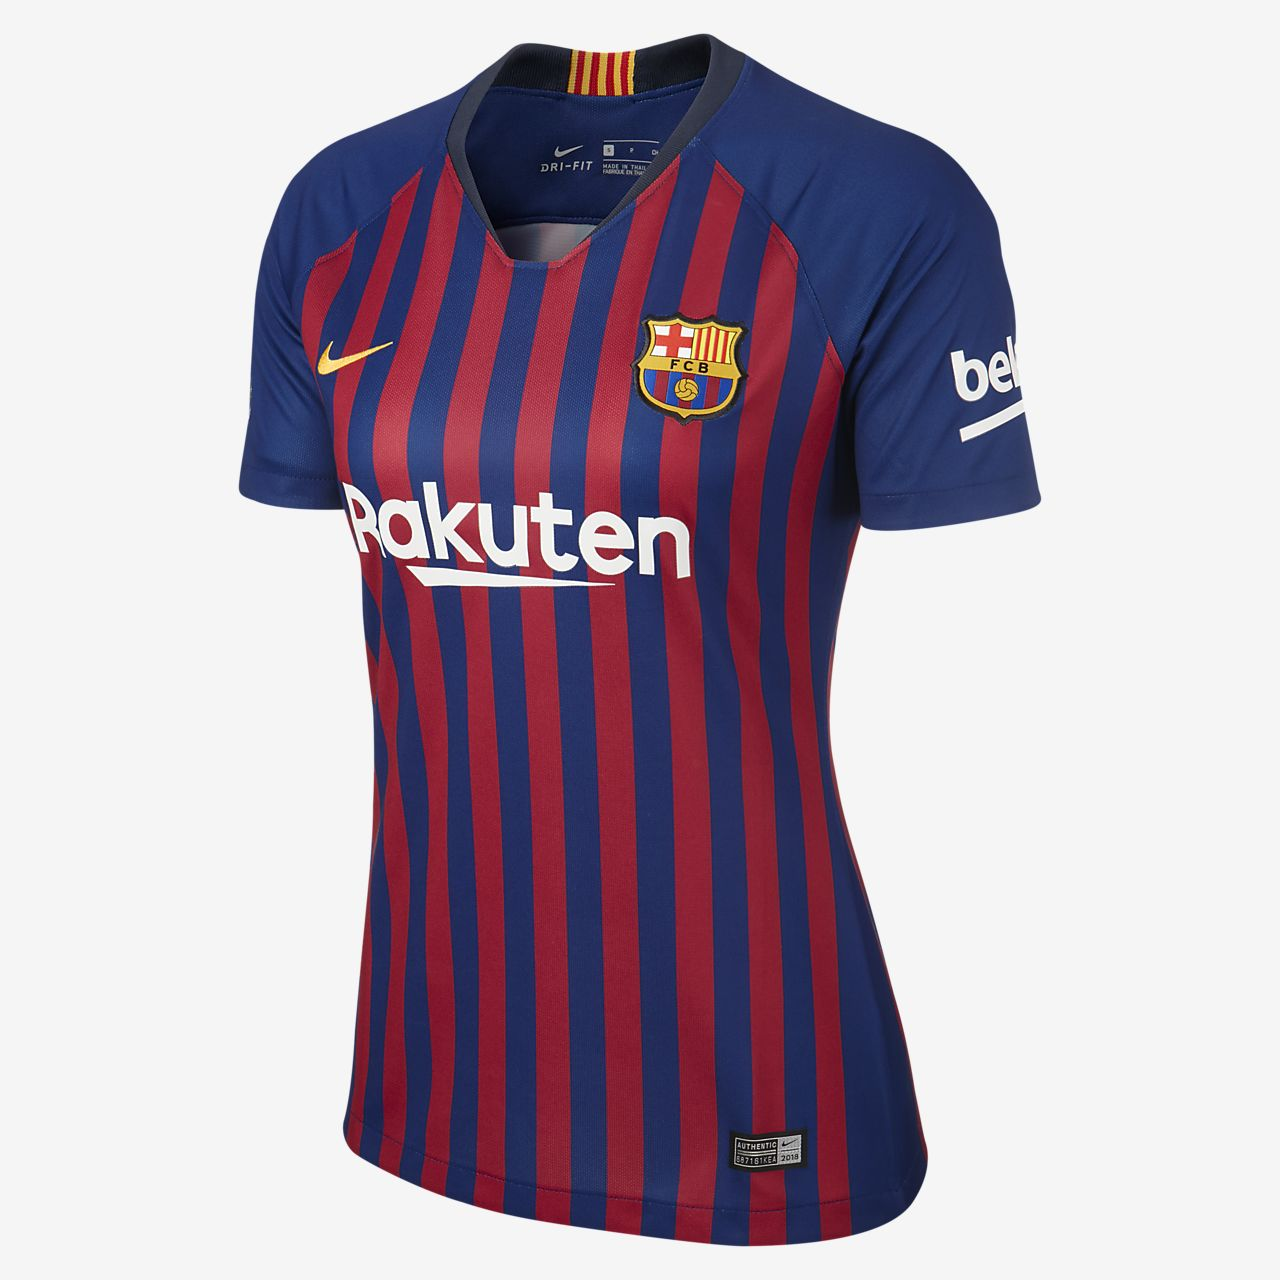 2018/19 FC Barcelona Stadium Home Women's Football Shirt